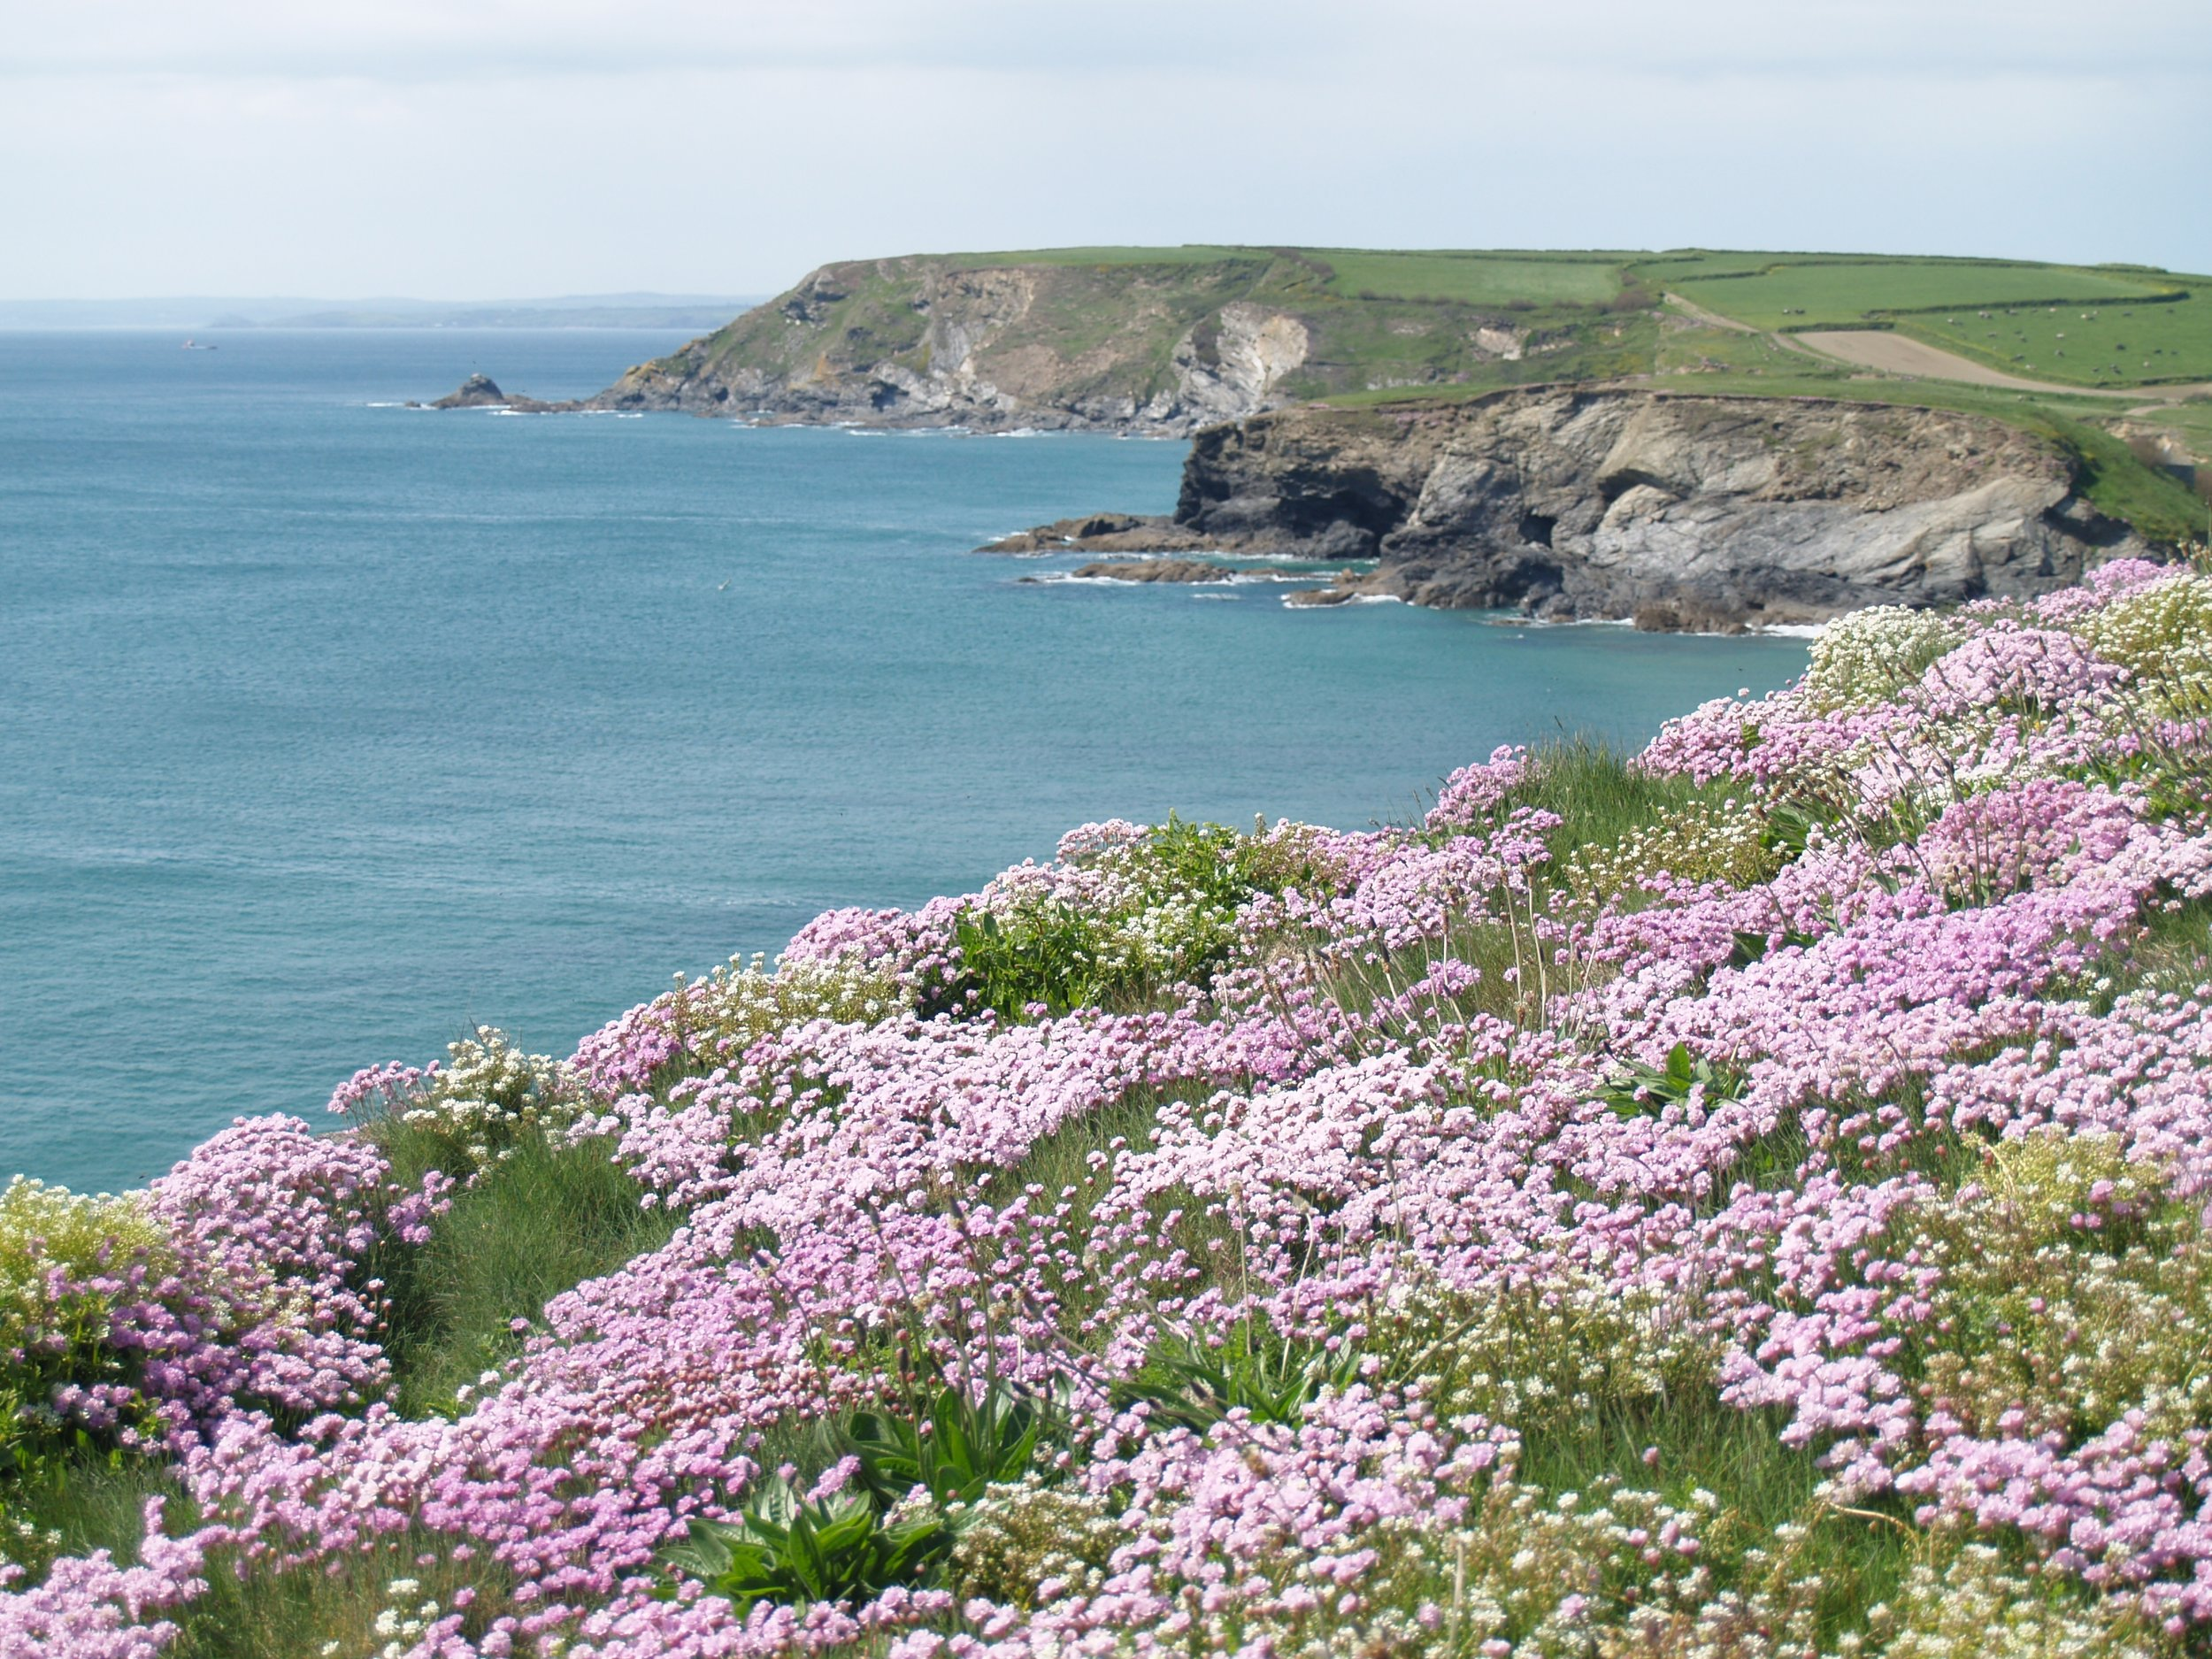 Coastal habitats could play a vital role in a Nature Recovery network. Photo: John Borlase